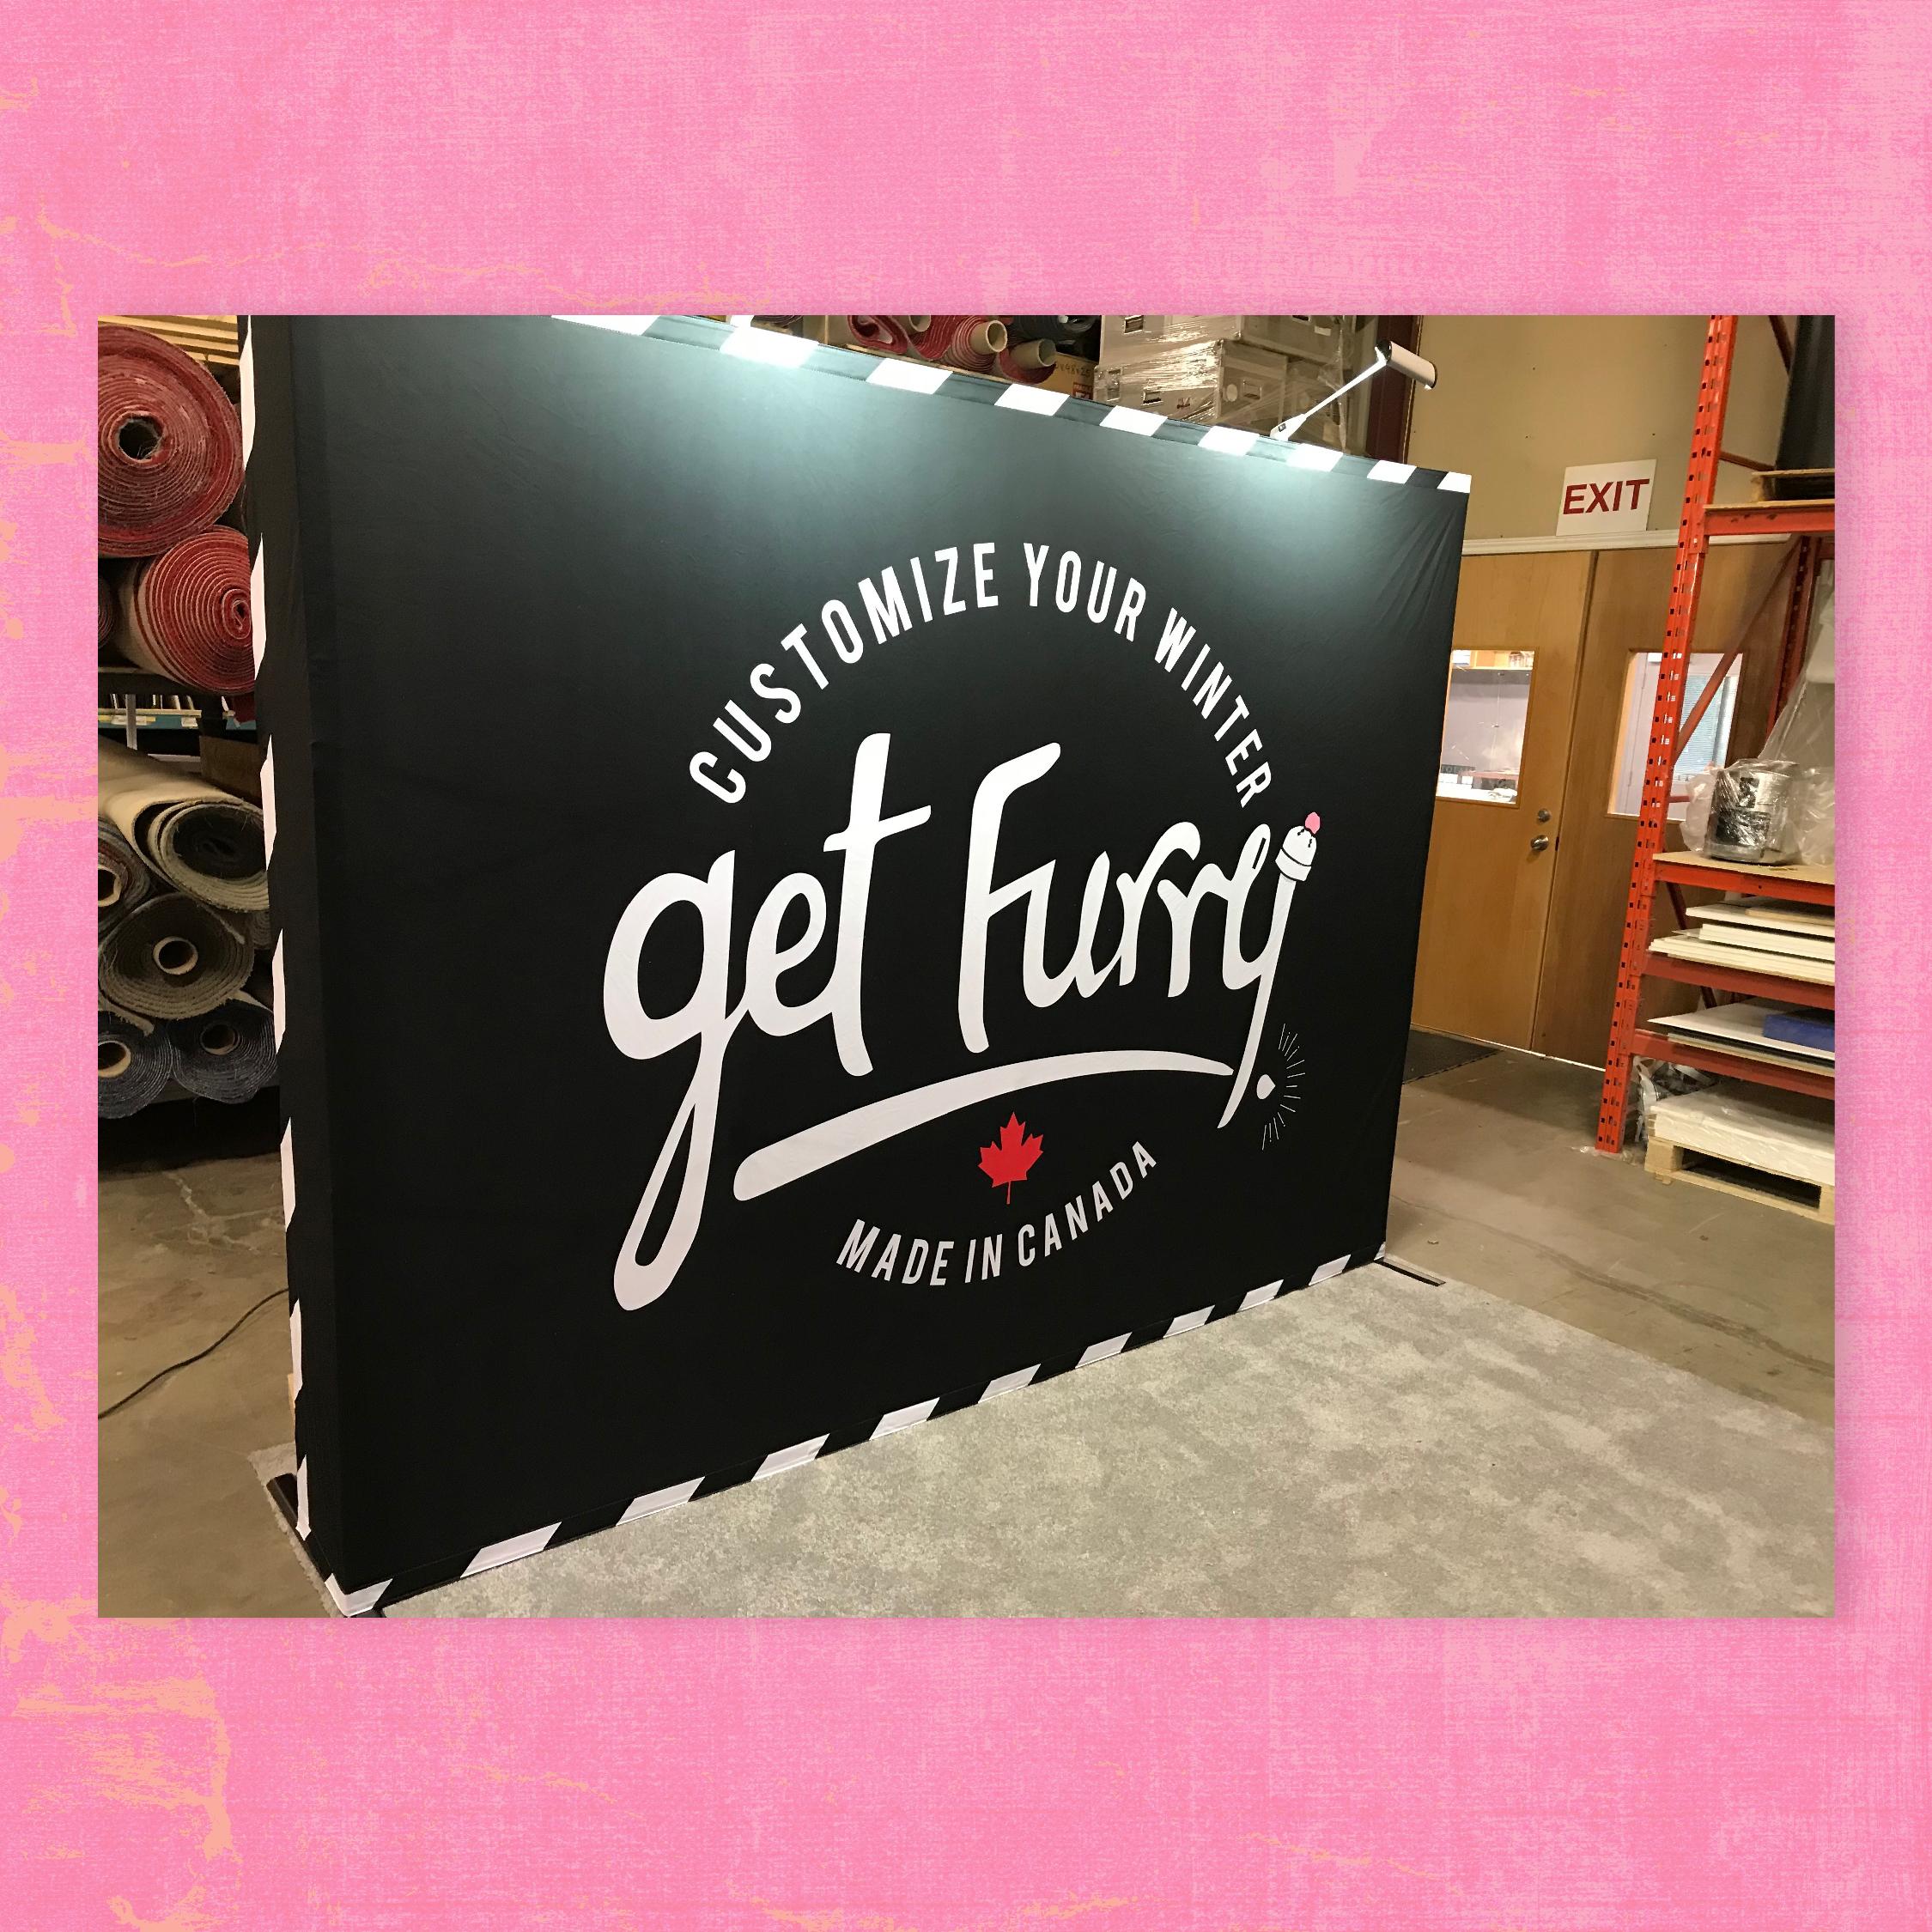 Get Furry Wall-01.jpg